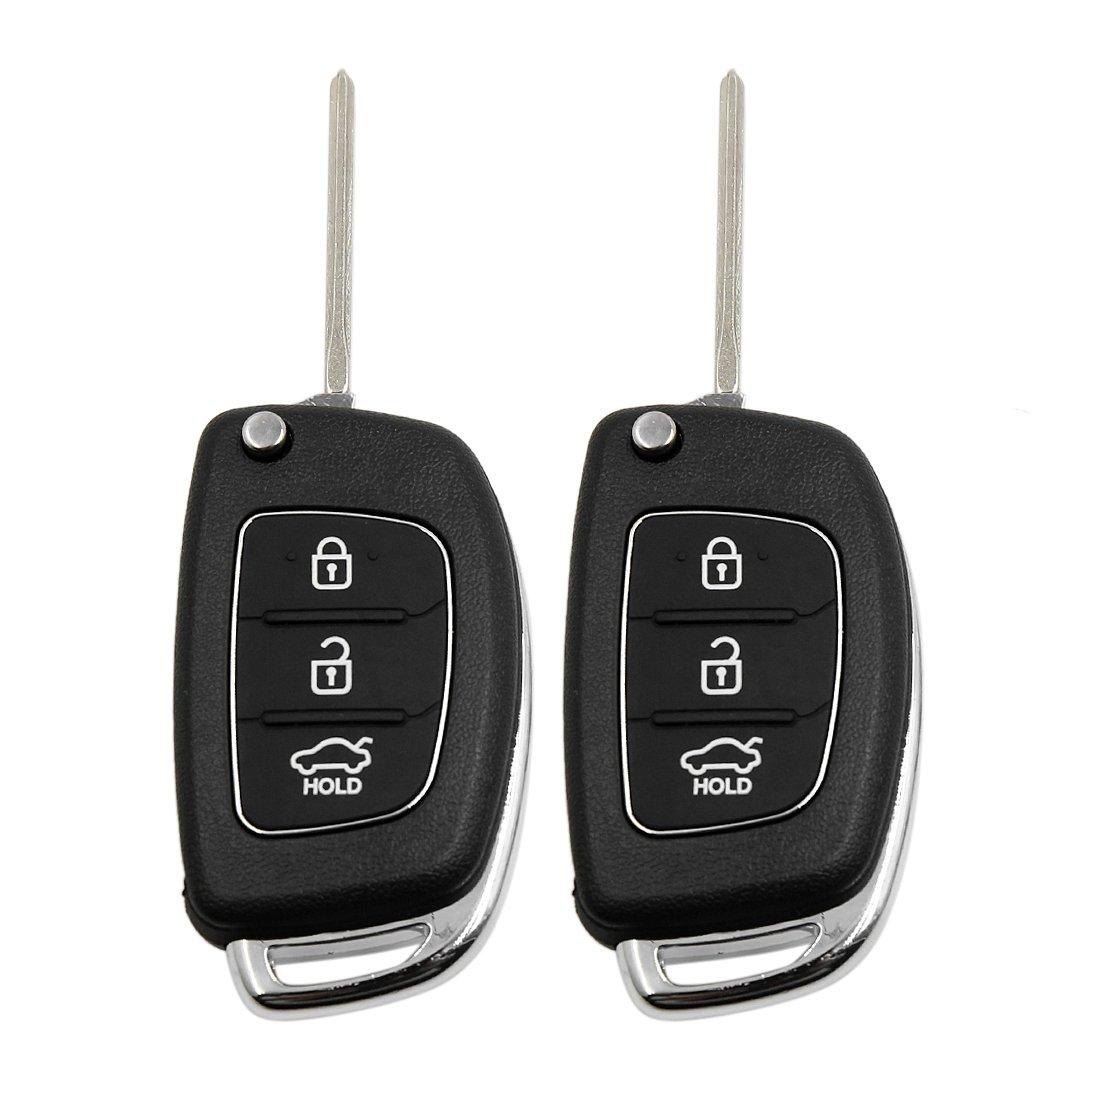 uxcell 2 Pcs 3 Buttons Flip Folding Uncut Key Remote Fob Case Replacement for Hyundai s17122500ux0049